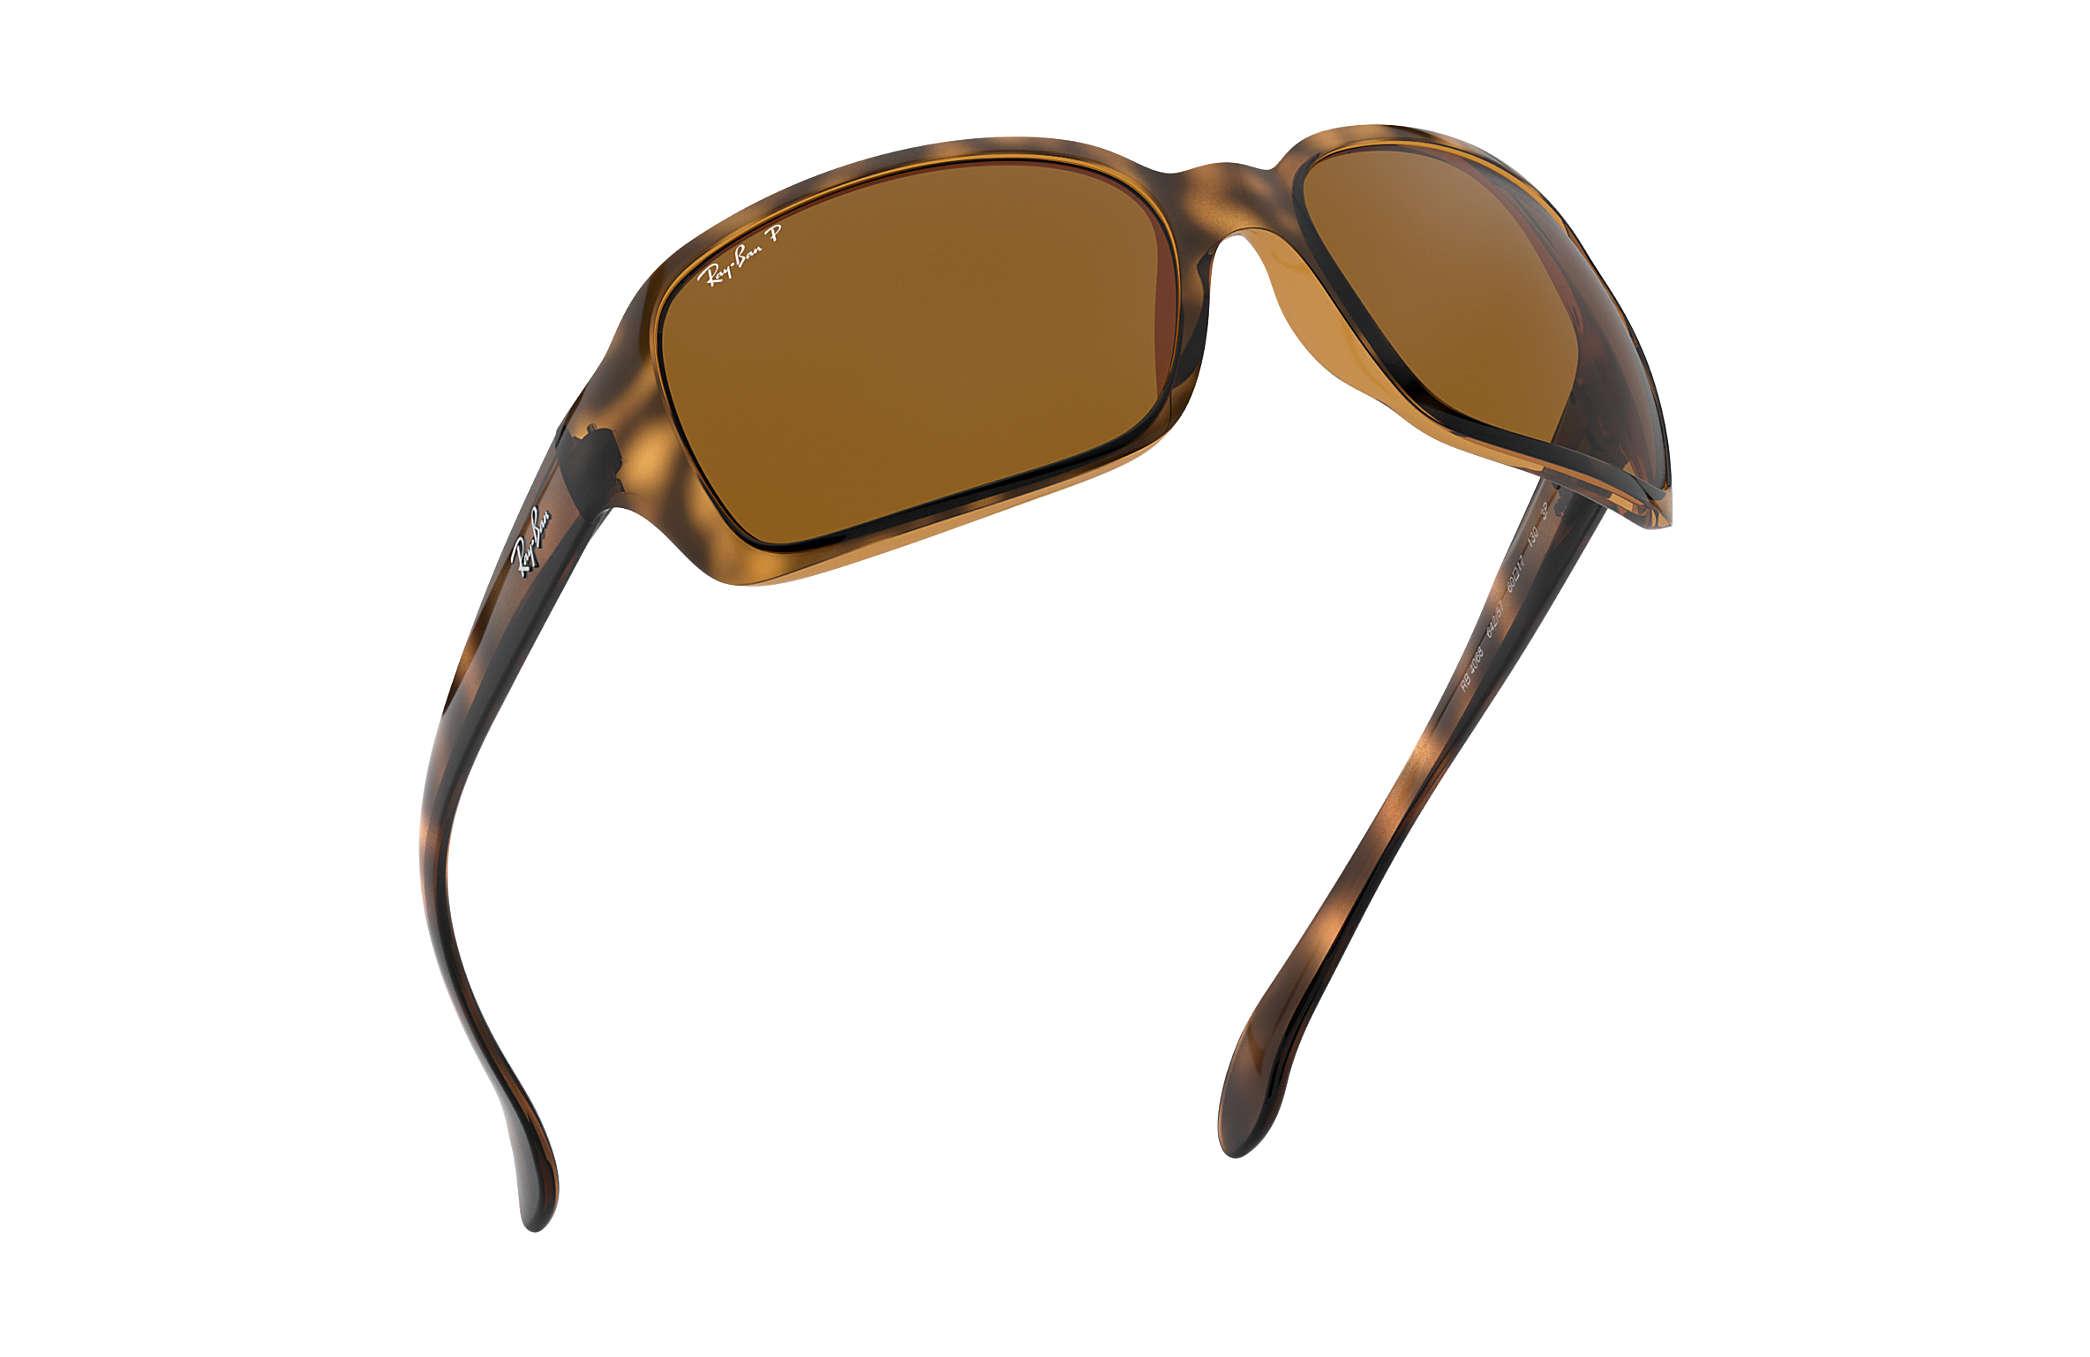 23ca95c21a8 Ray-Ban RB4068 Tortoise - Nylon - Brown Polarized Lenses ...